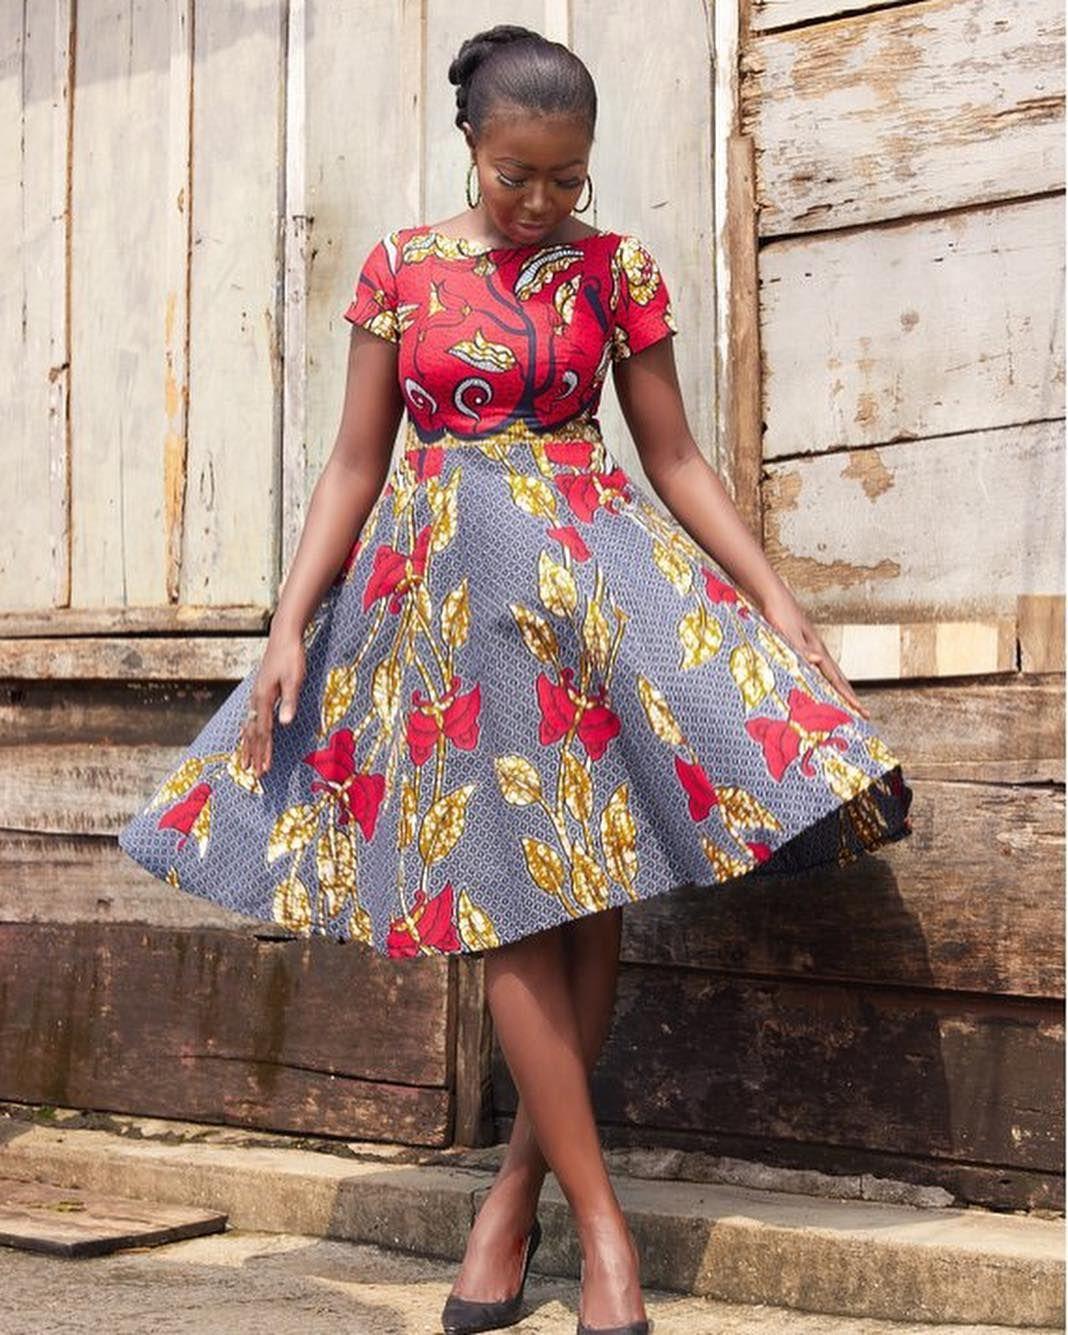 Ankara Jumpsuits Are Trendy Stylish And Fashionable Mammypi Com African Print Fashion Dresses African Fashion African Men Fashion [ 1335 x 1068 Pixel ]